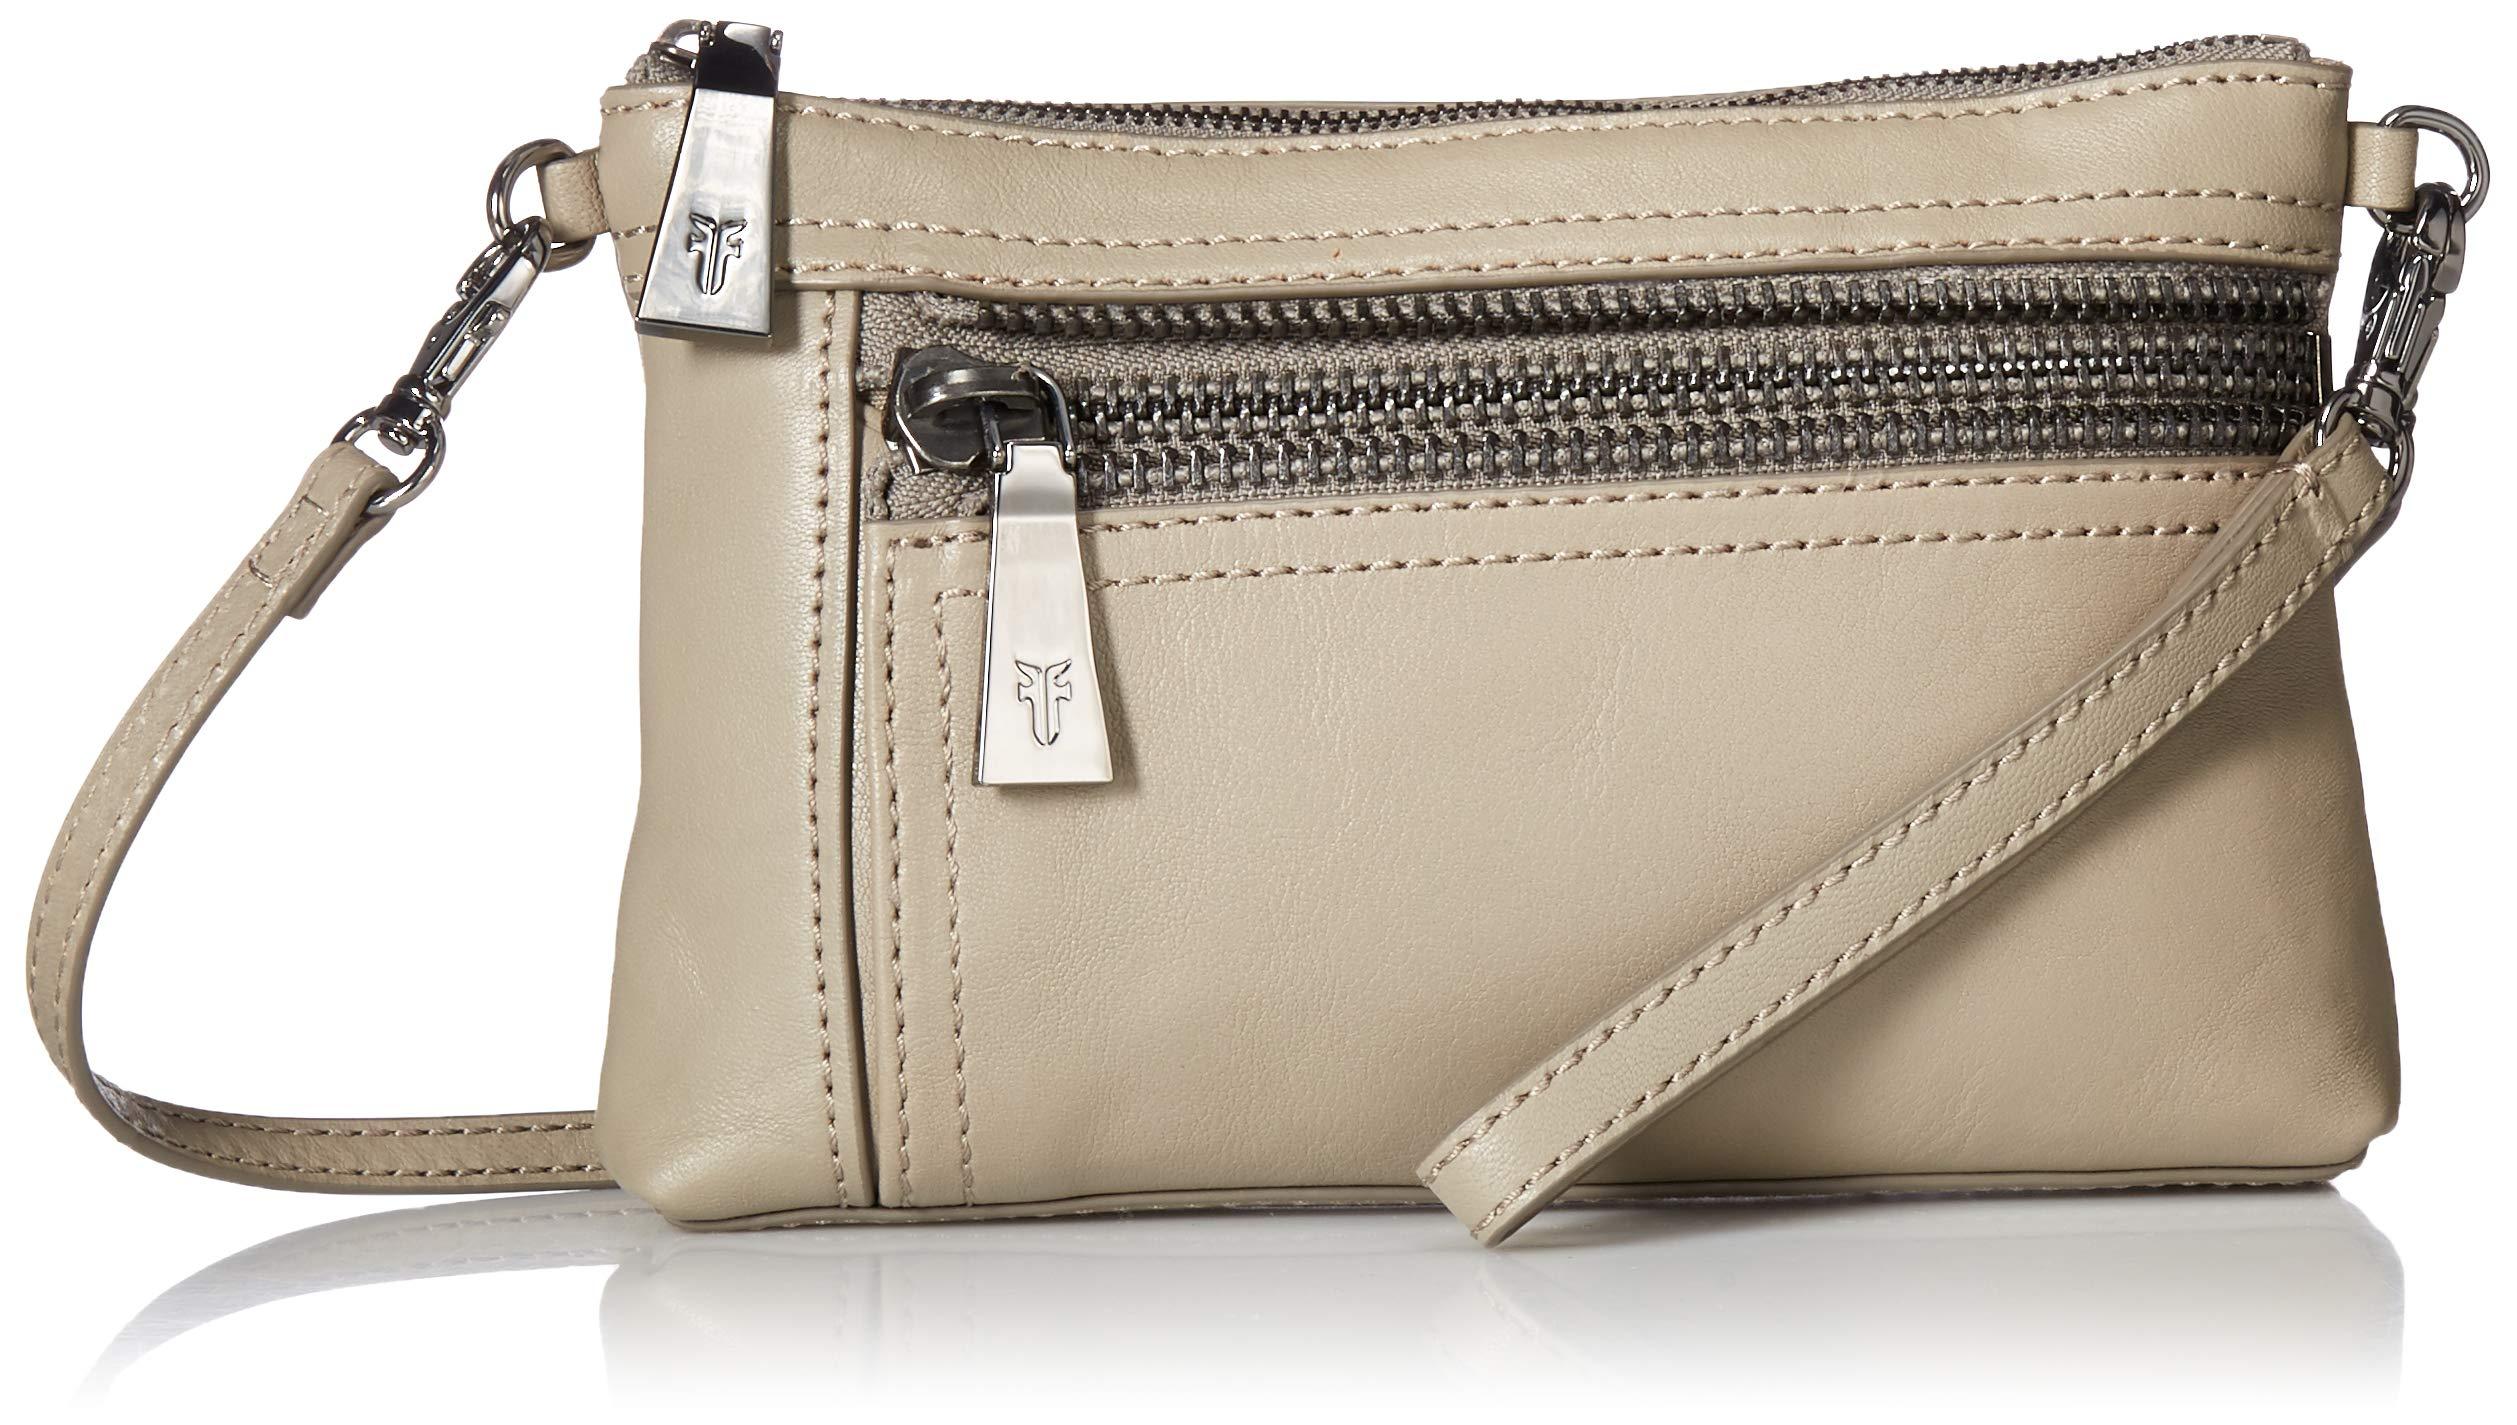 FRYE Lena Zip Leather Crossbody Wristlet Bag, grey